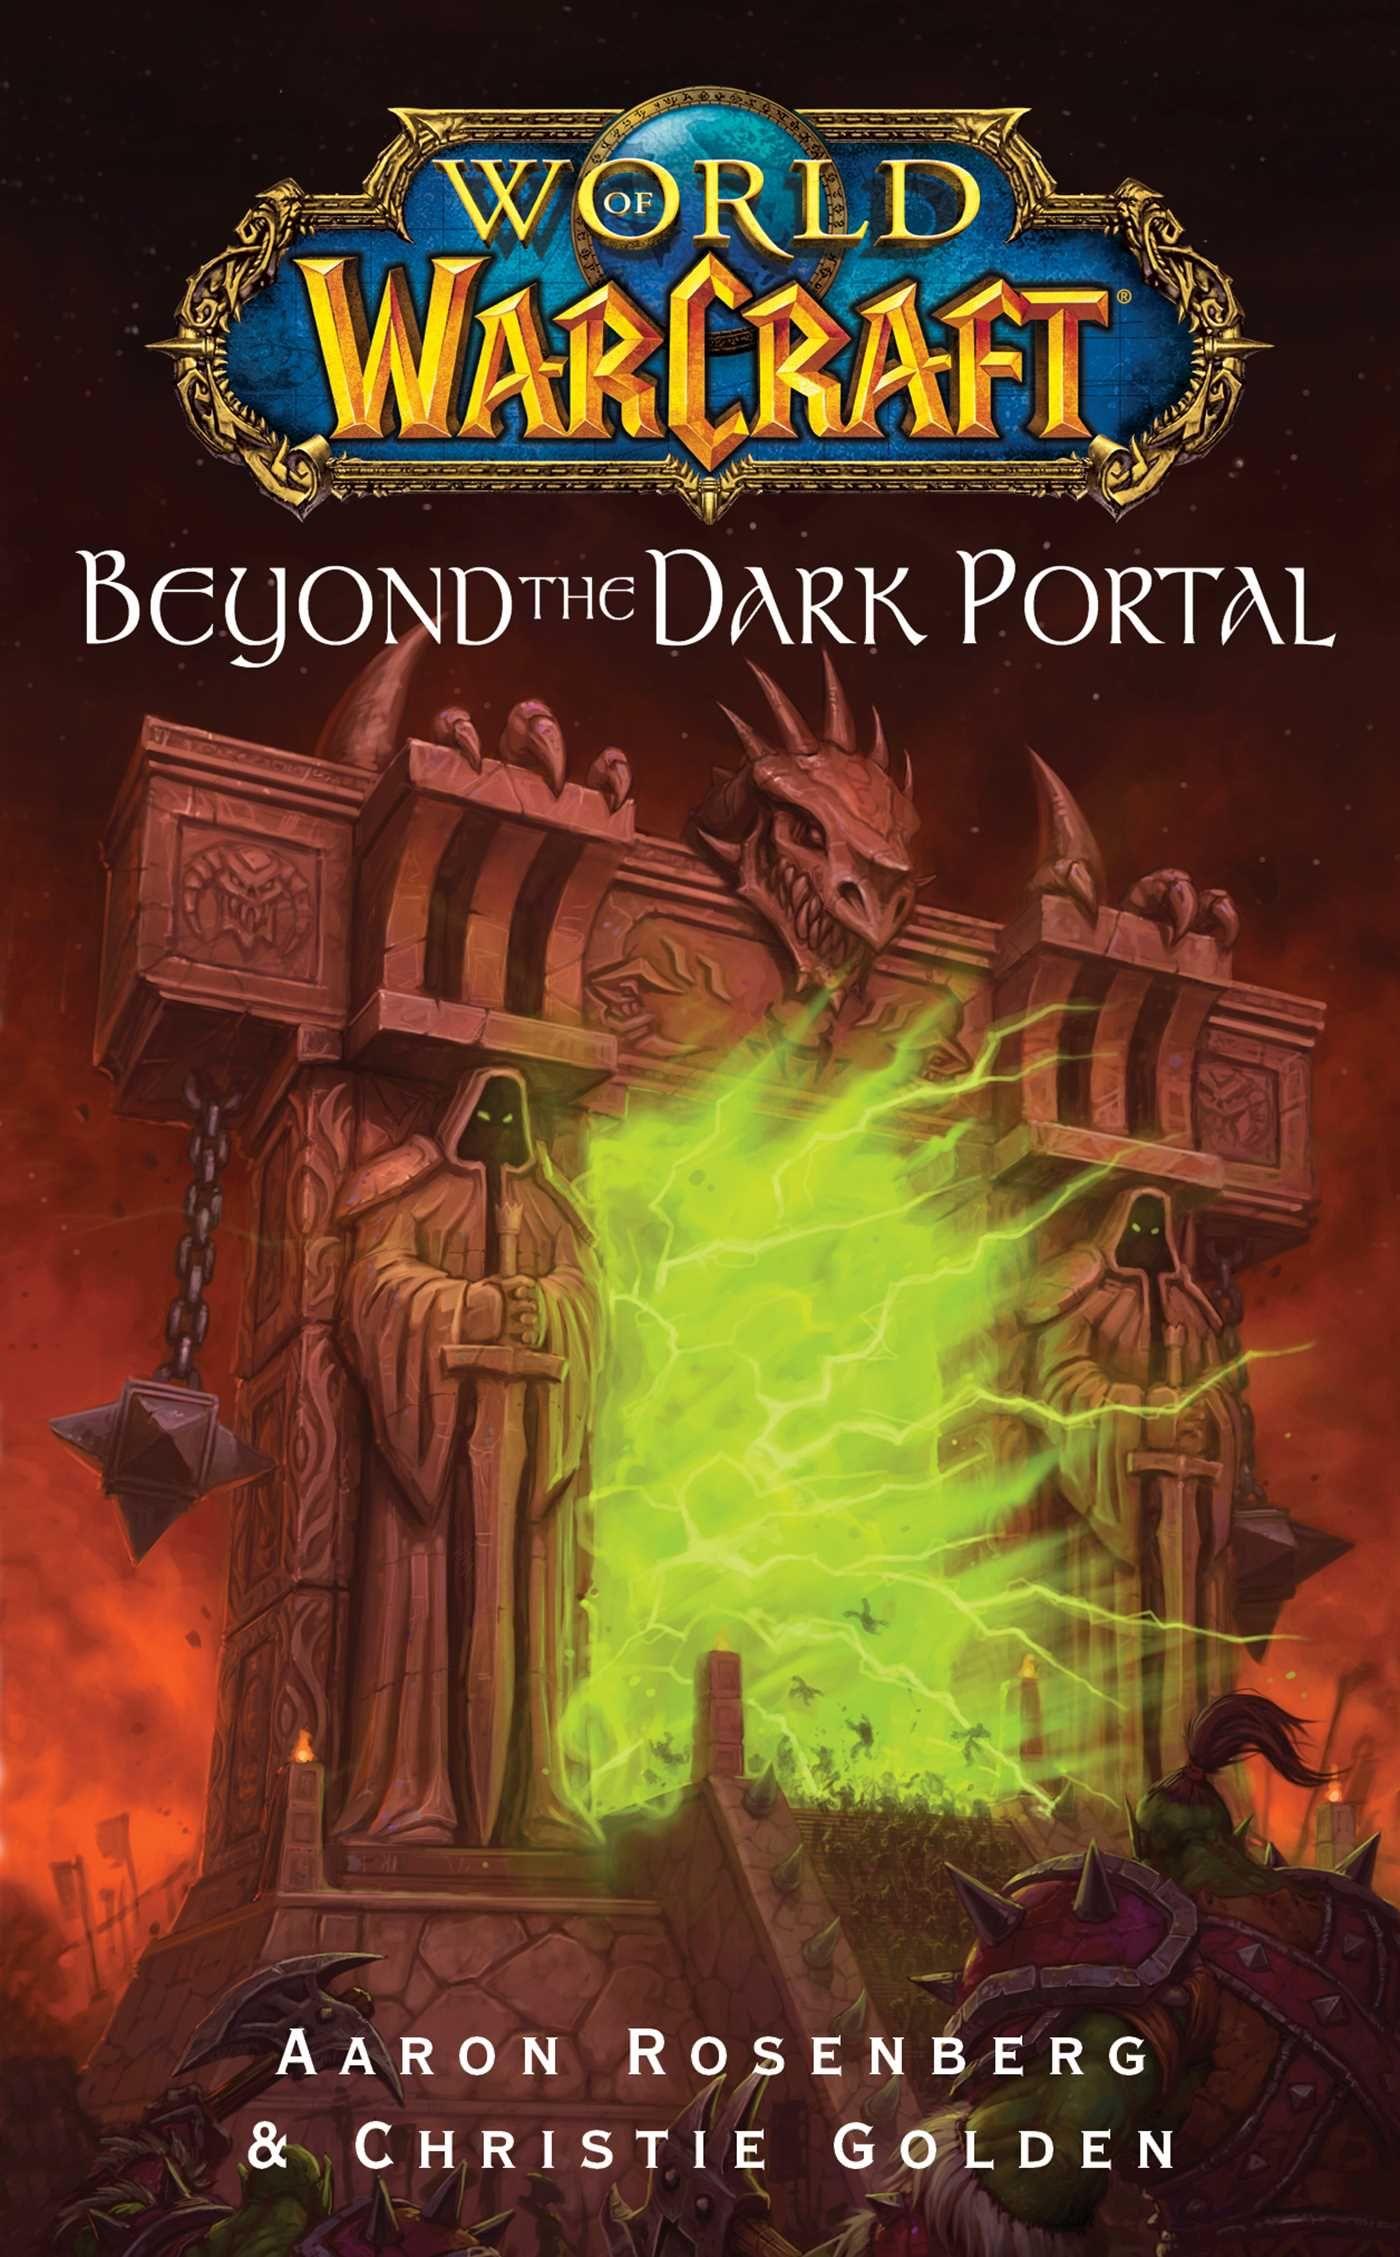 World of Warcraft: Beyond the Dark Portal - 1